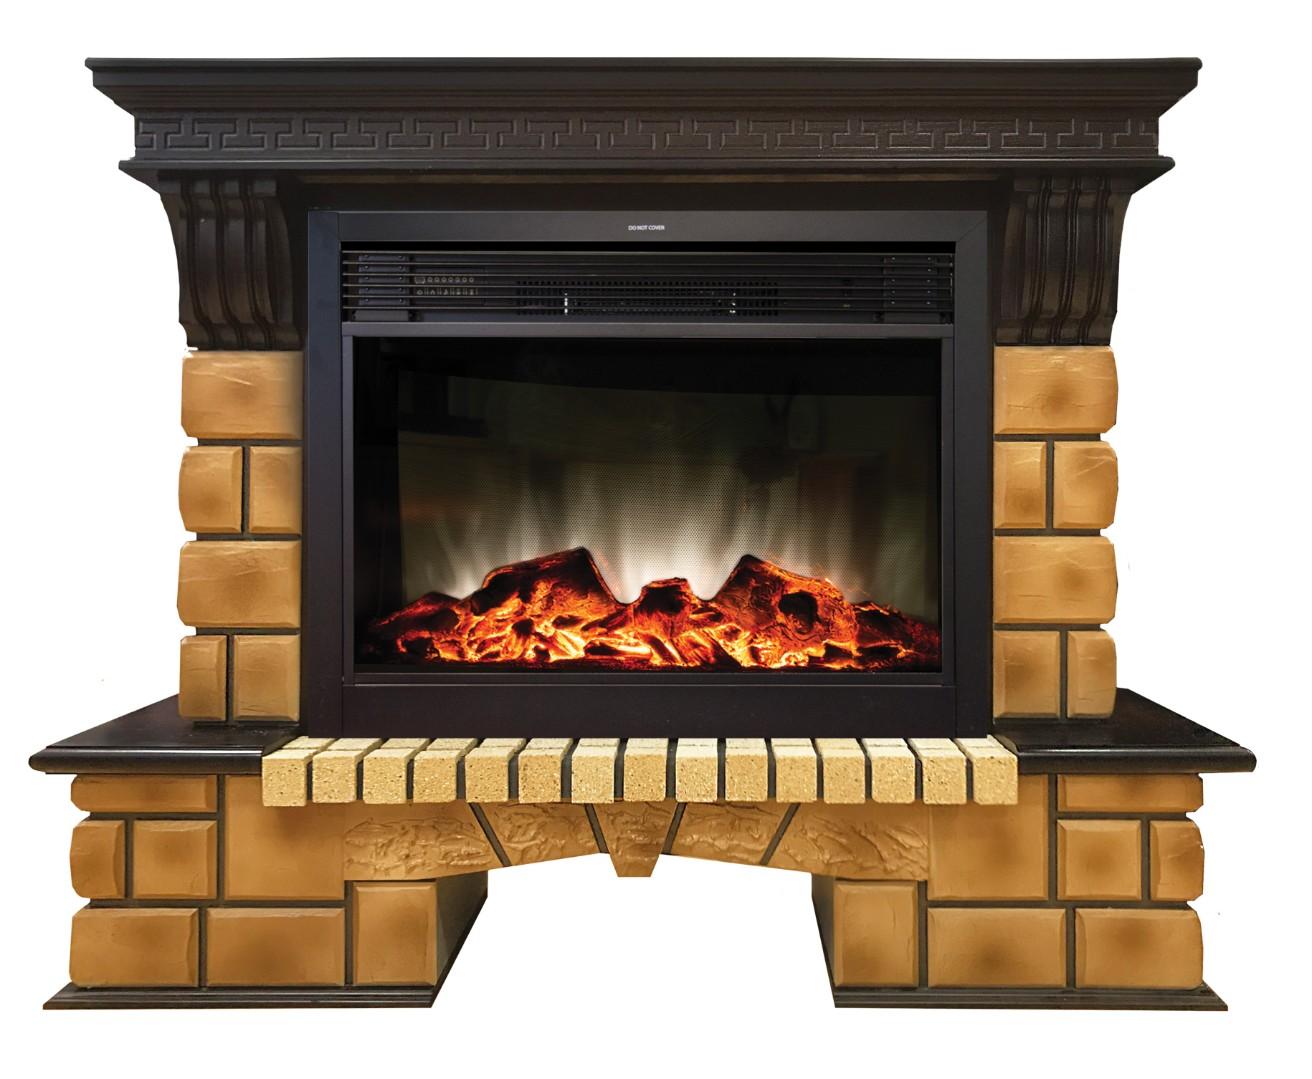 Каминокомплект Real Flame Stone Brick 26 AO с Moonblaze Lux BL S (в наличии и под заказ)